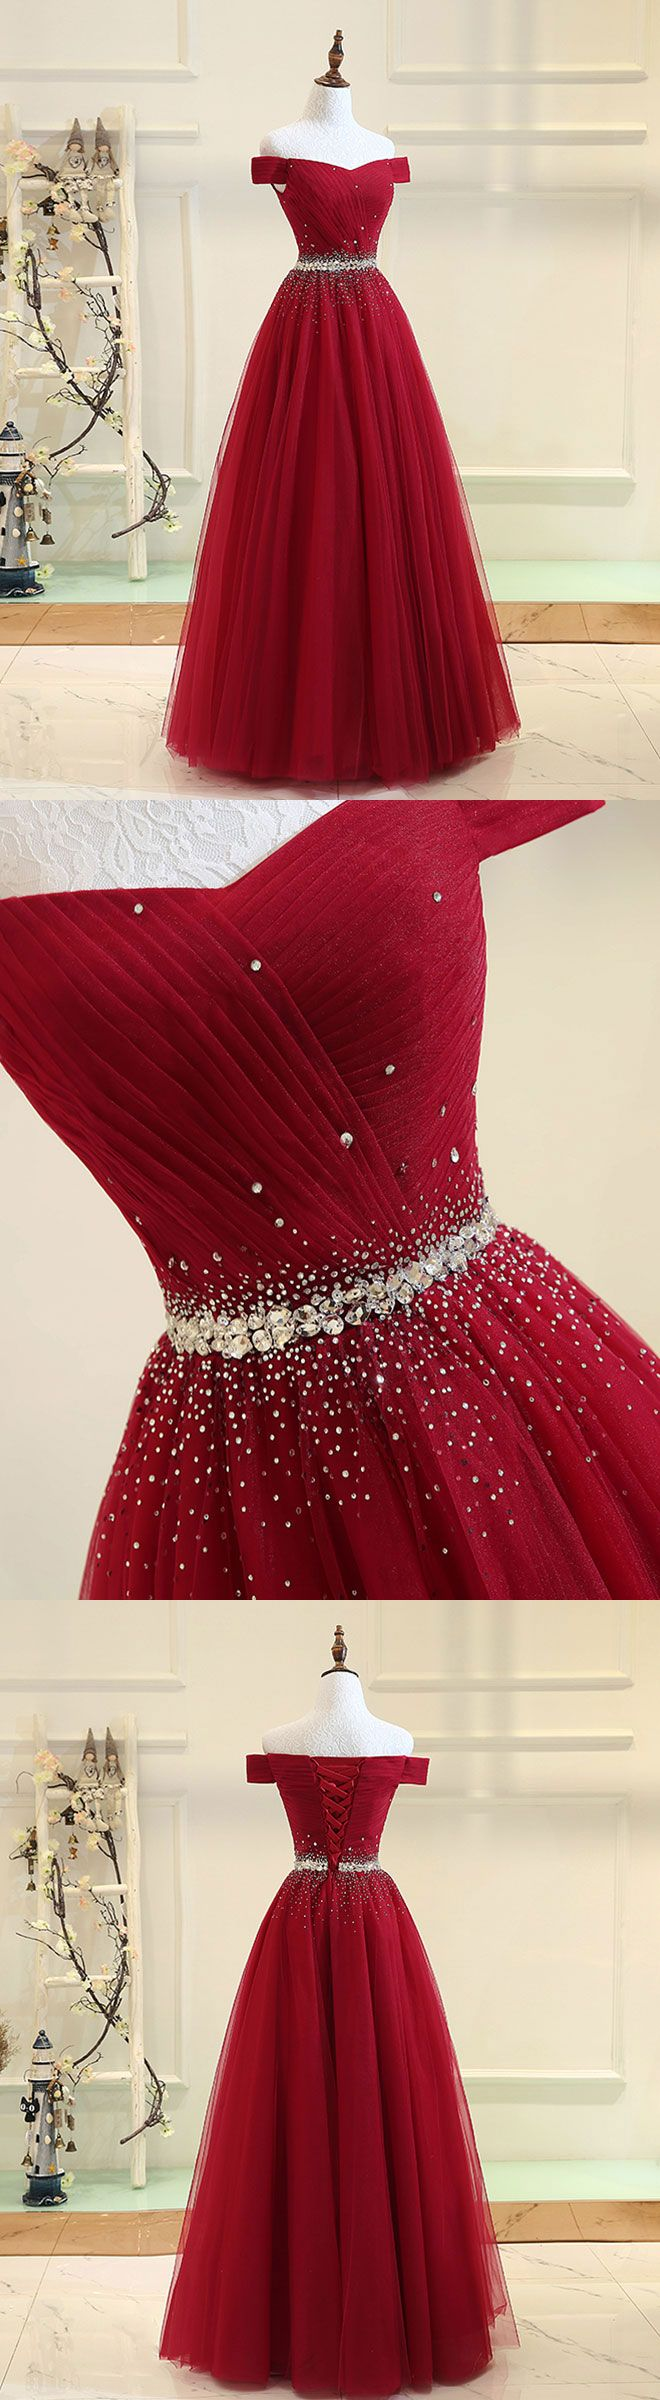 6c330cac35db Burgundy tulle off shoulder long prom dress